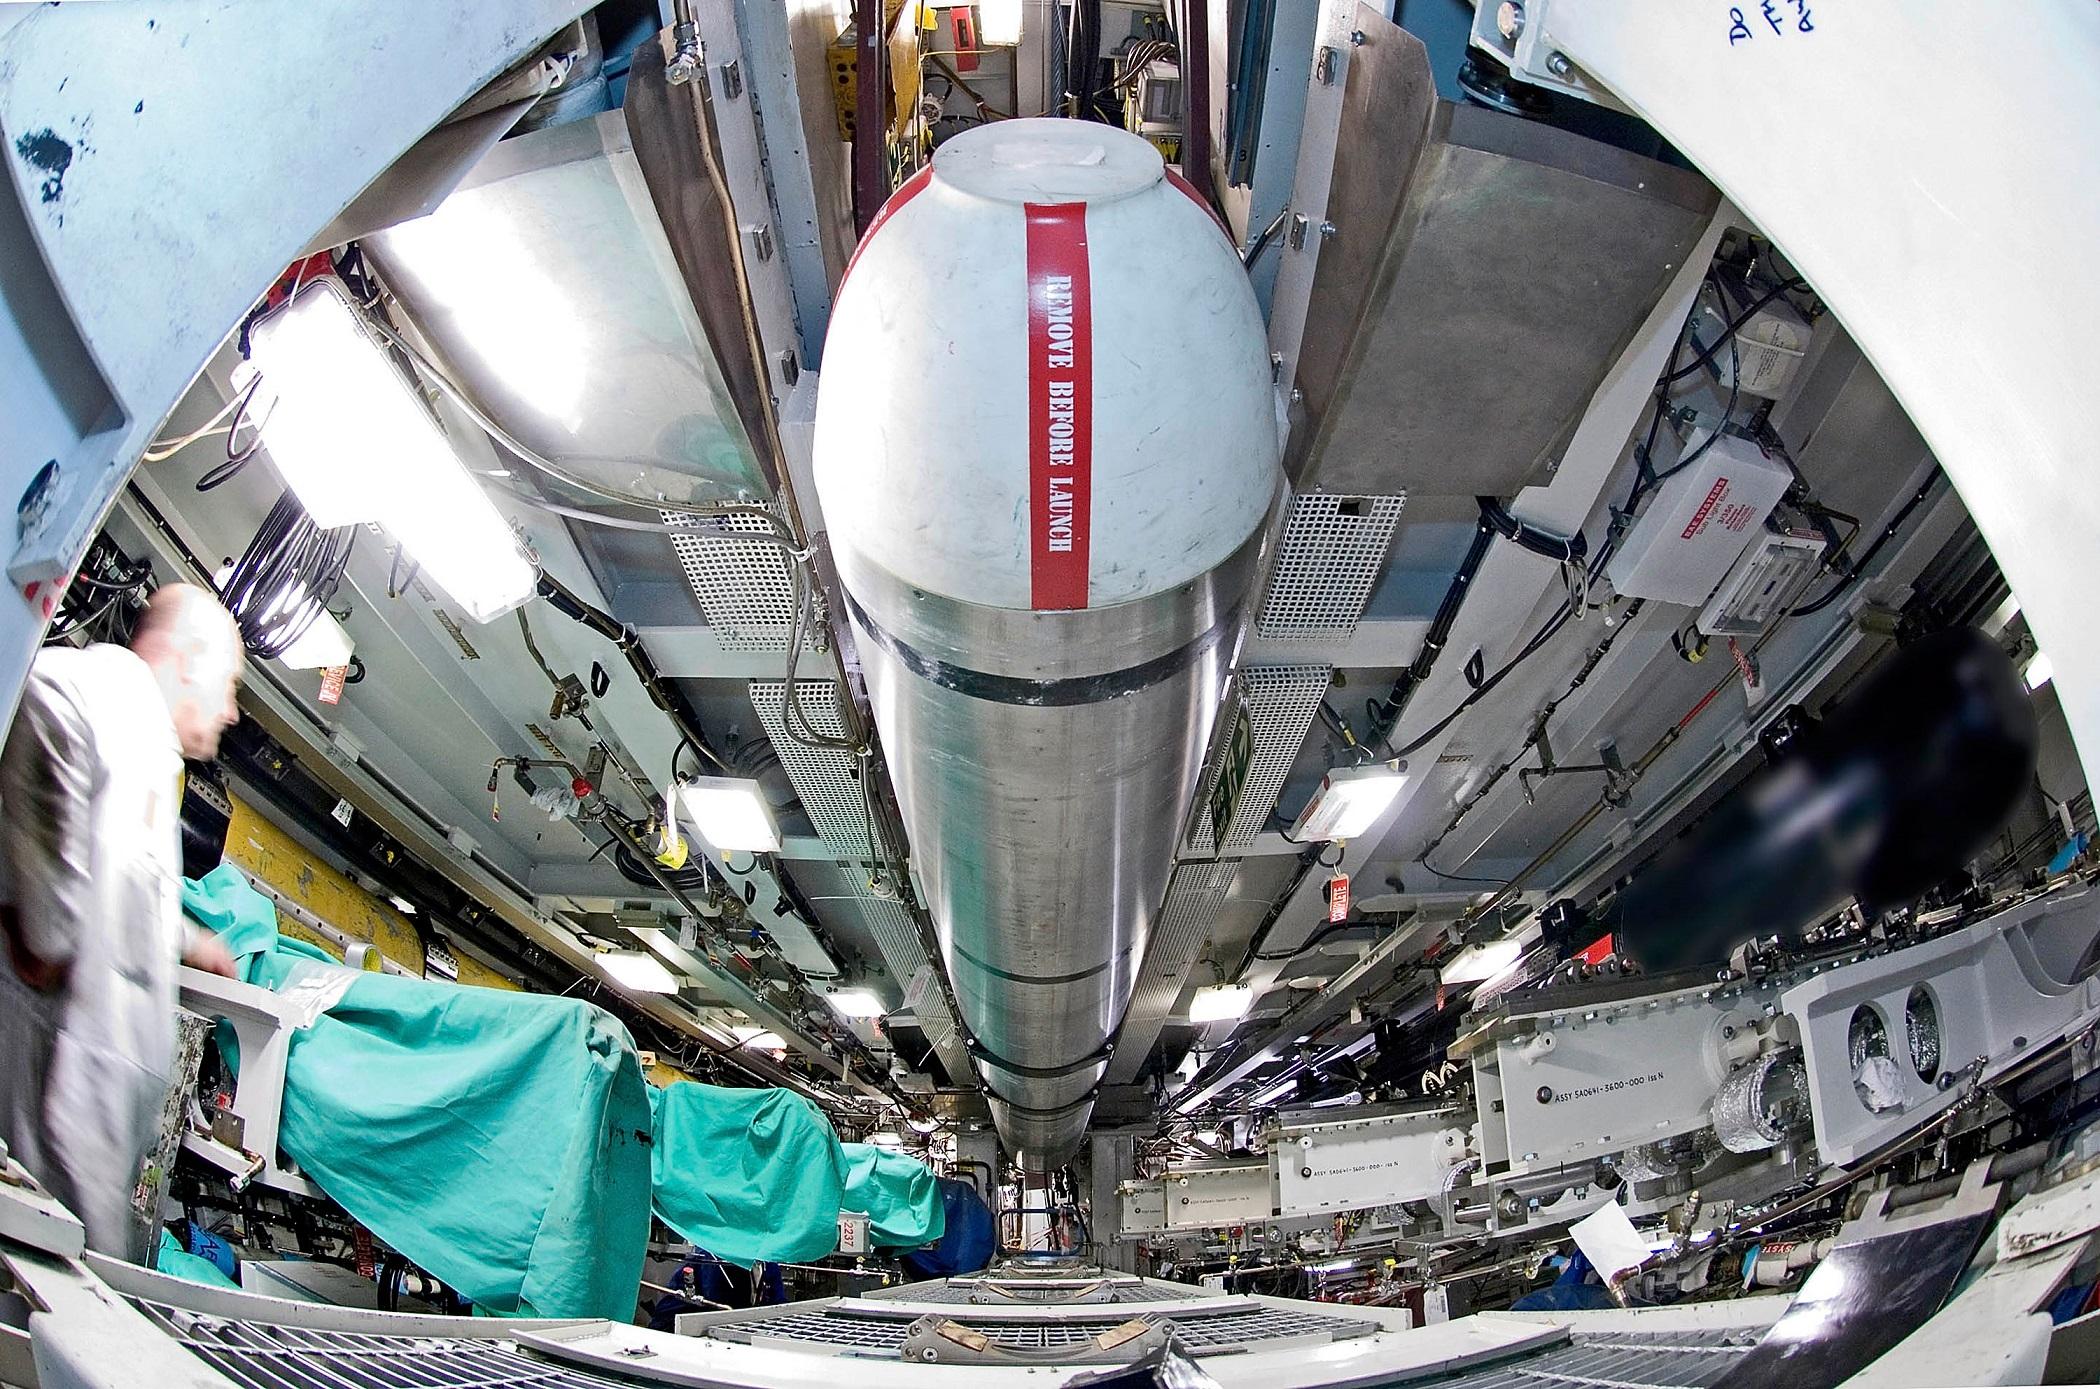 Risultati immagini per armi nucleari